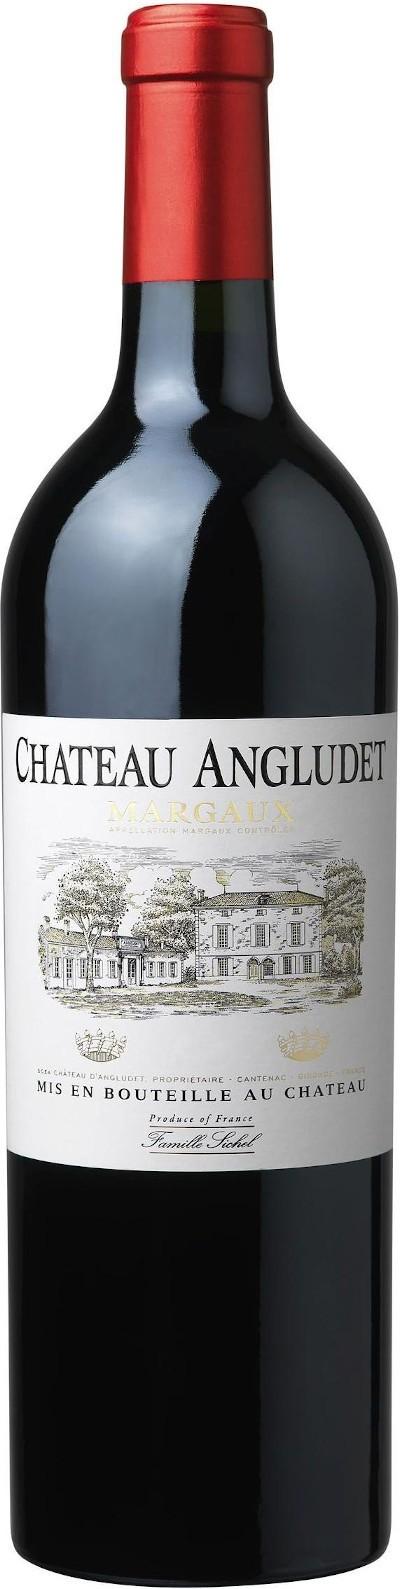 Chateau Angludet - Margaux, 2013